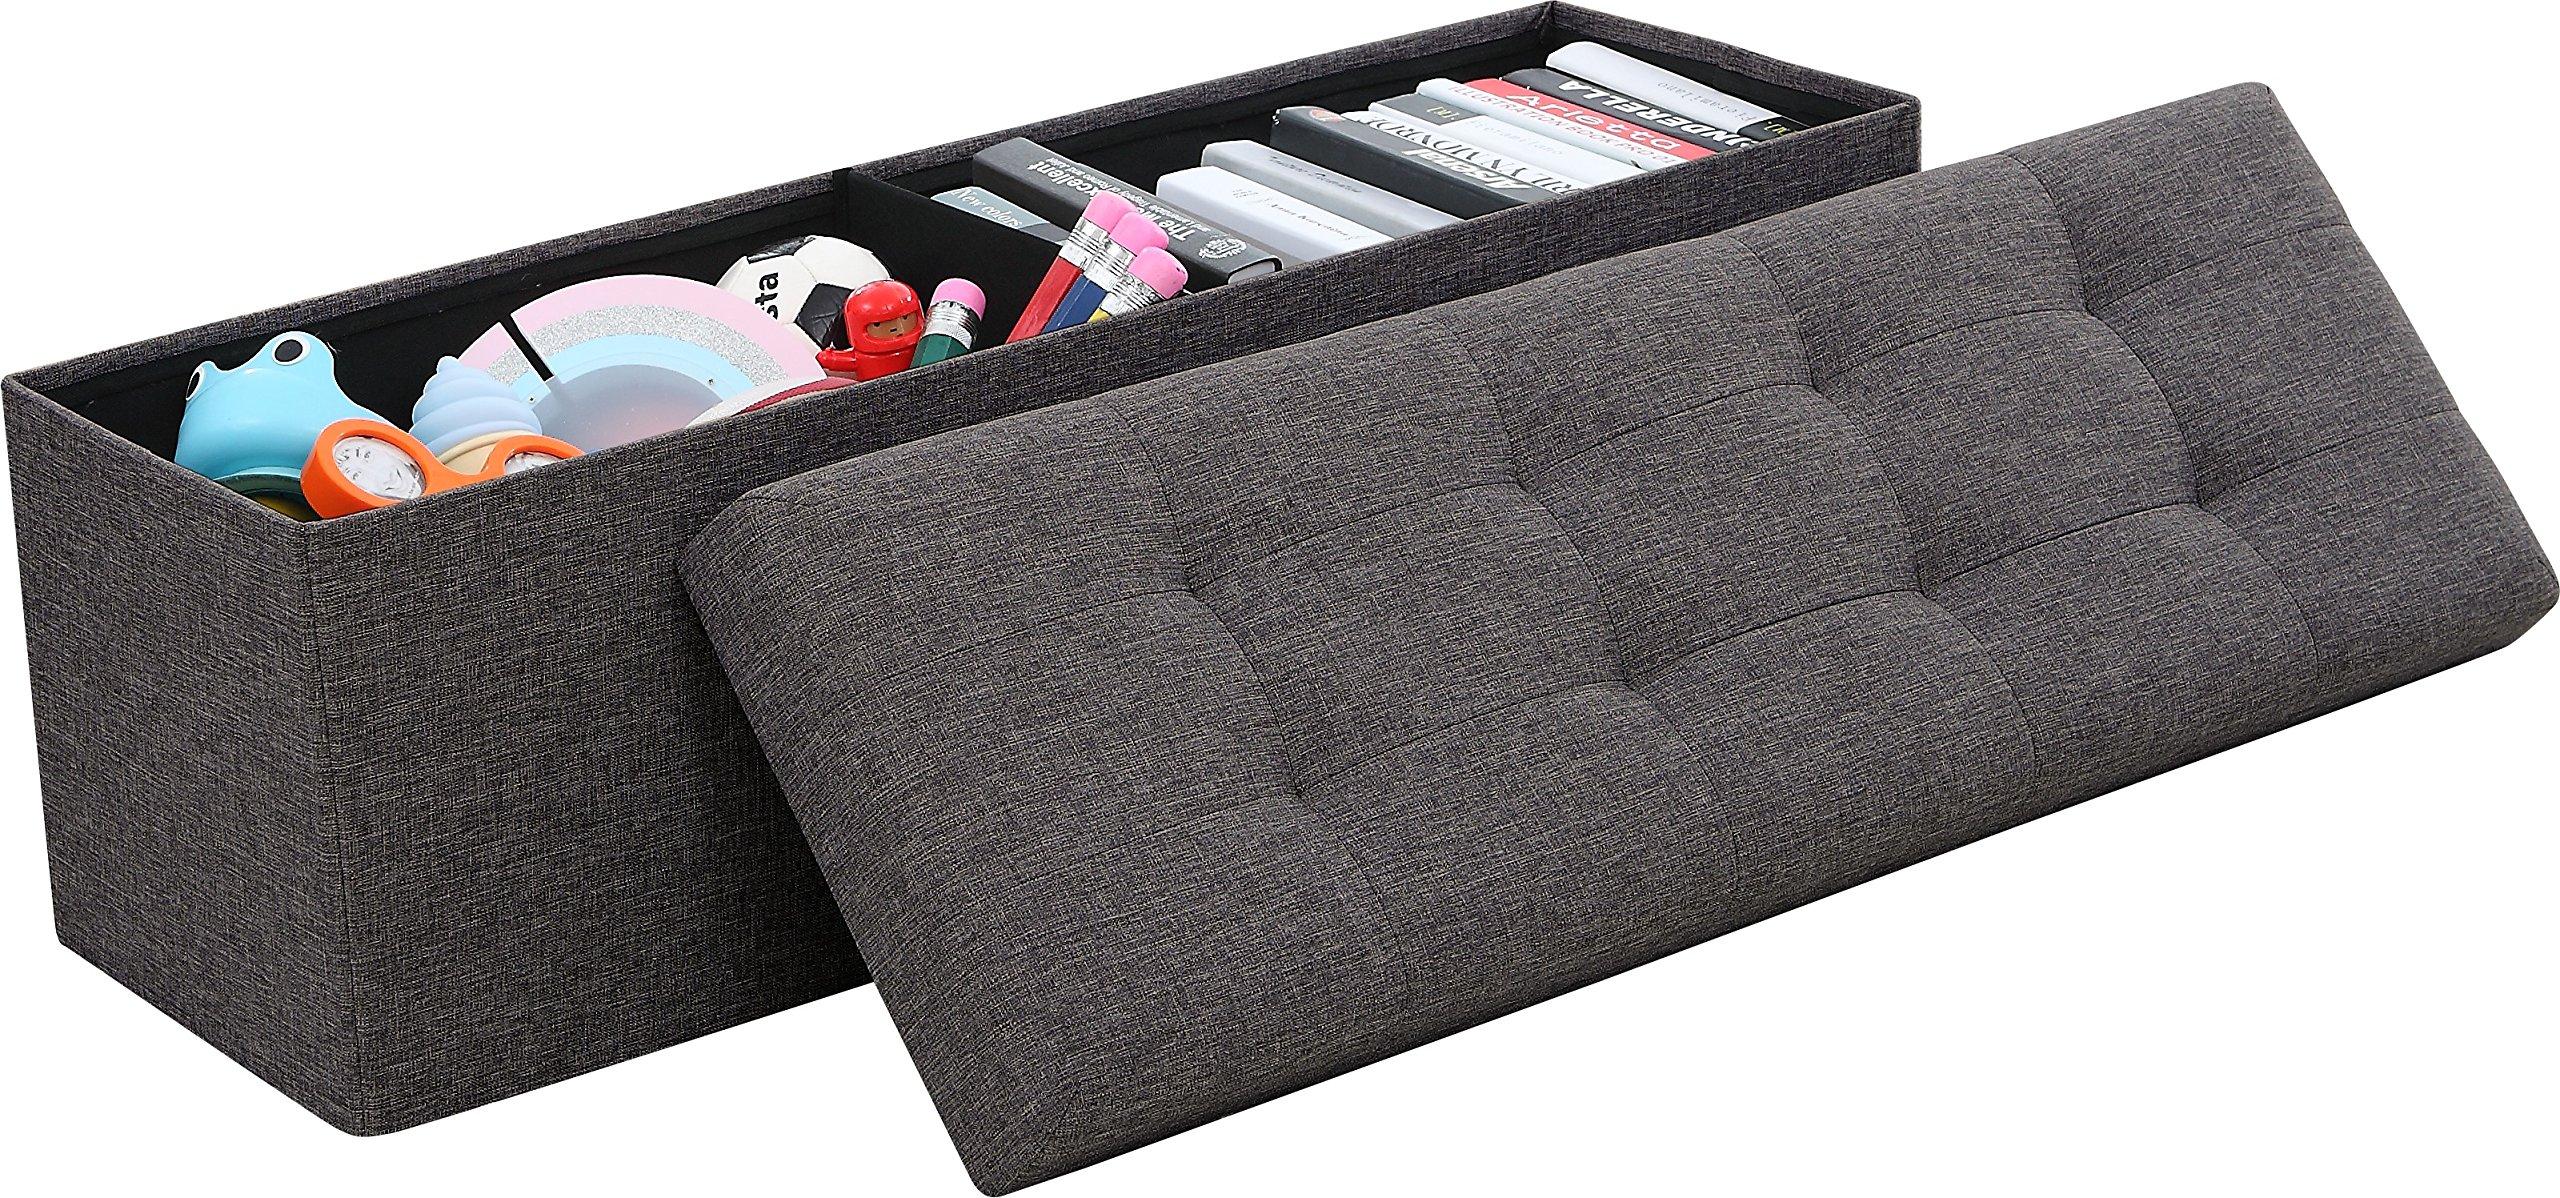 Ellington Home Foldable Tufted Linen Large Storage Ottoman Bench Foot Rest Stool/Seat - 15'' x 45'' x 15'' (Charcoal) by Ellington Home